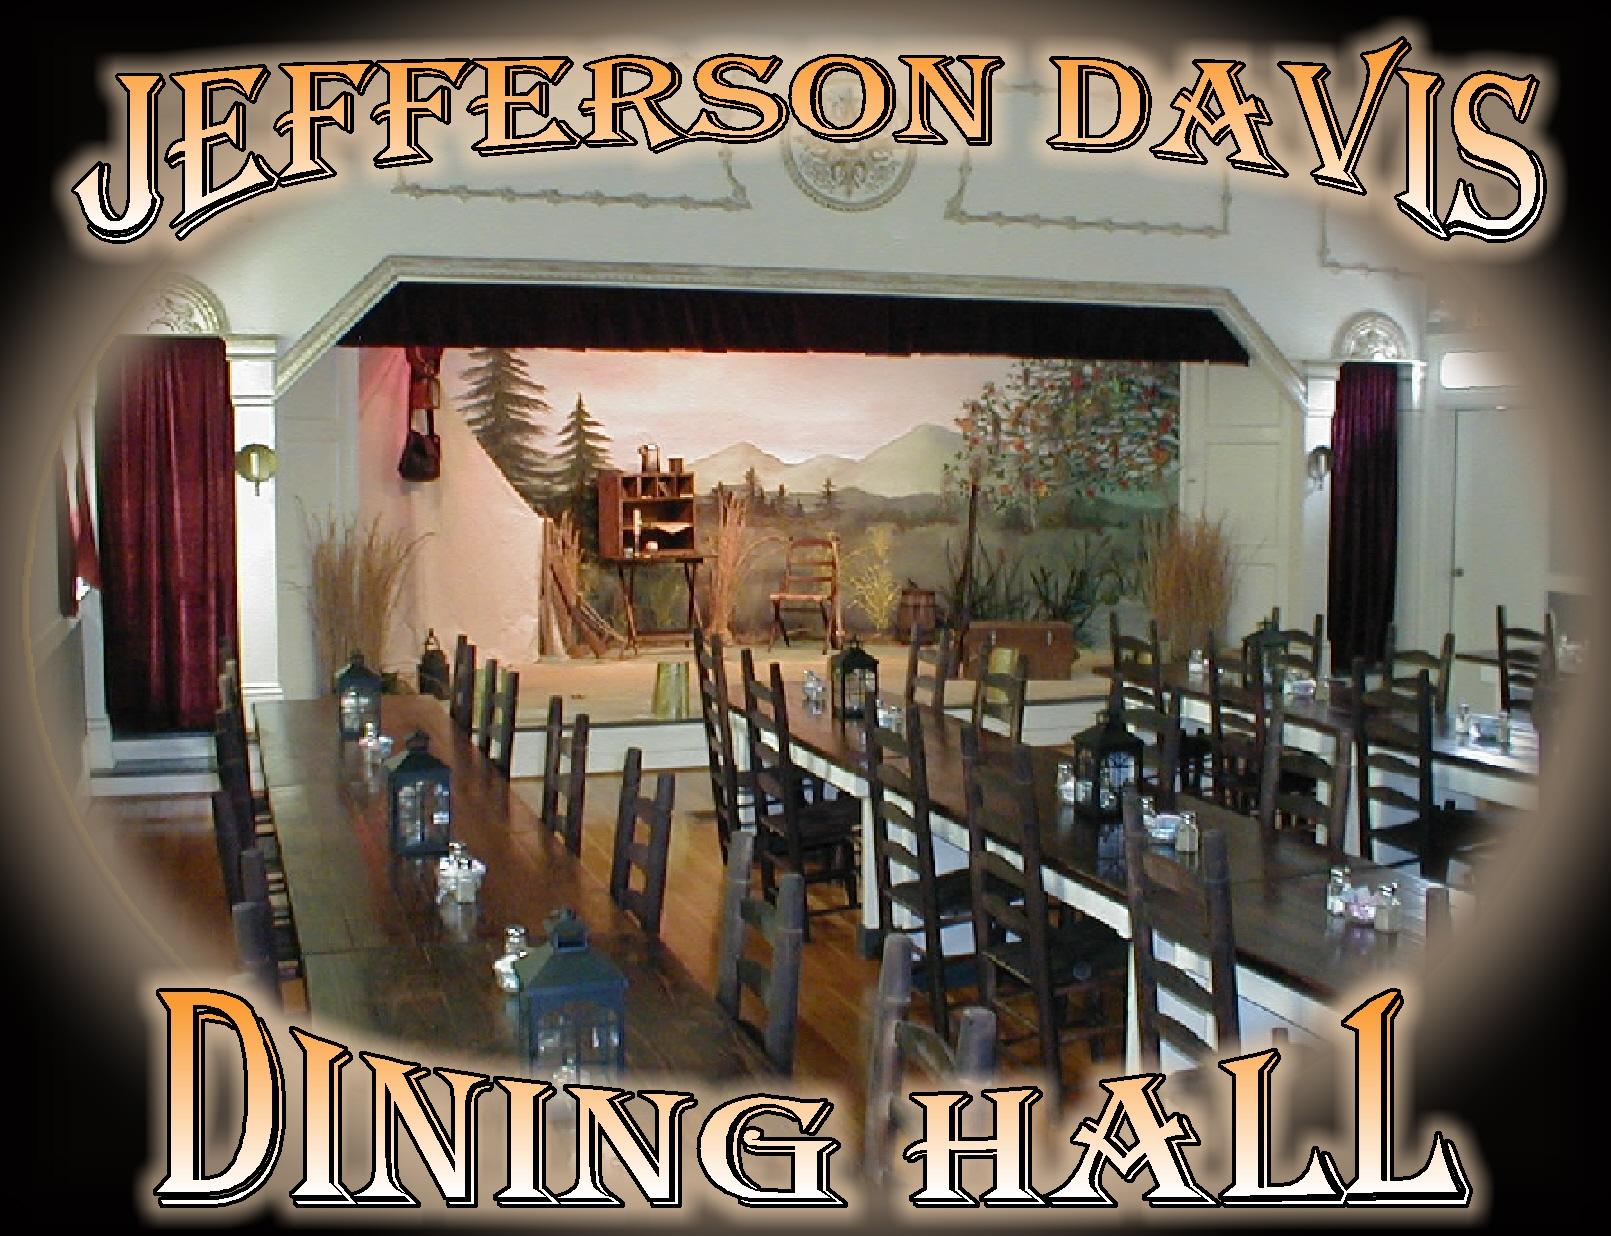 Buttonwillow Civil War Dinner Theater image 0